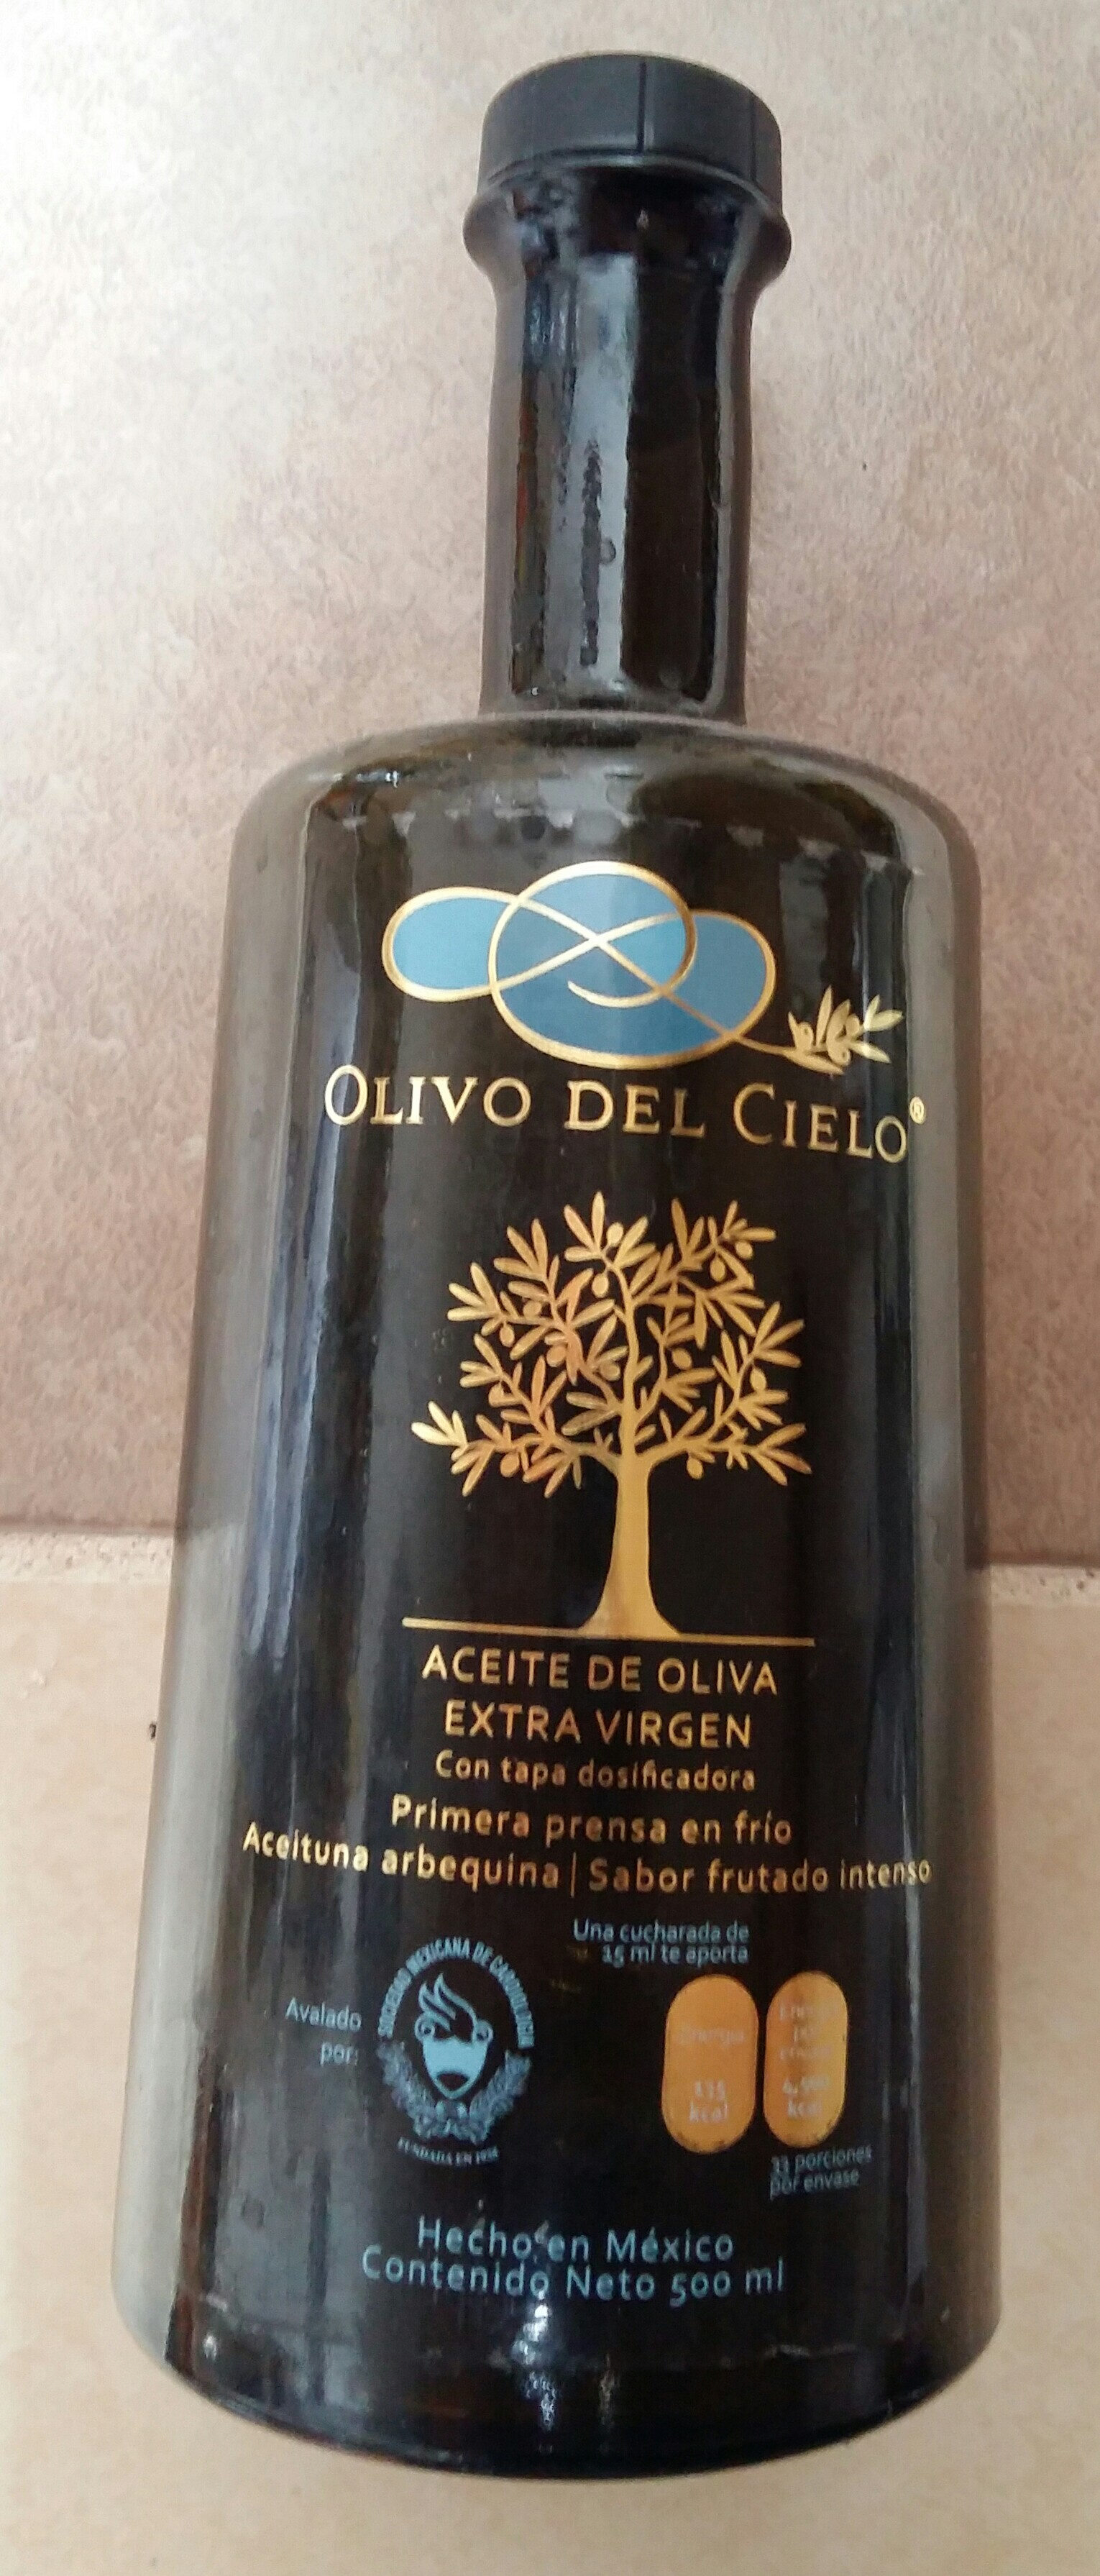 Aceite de oliva extra virgen - Product - es